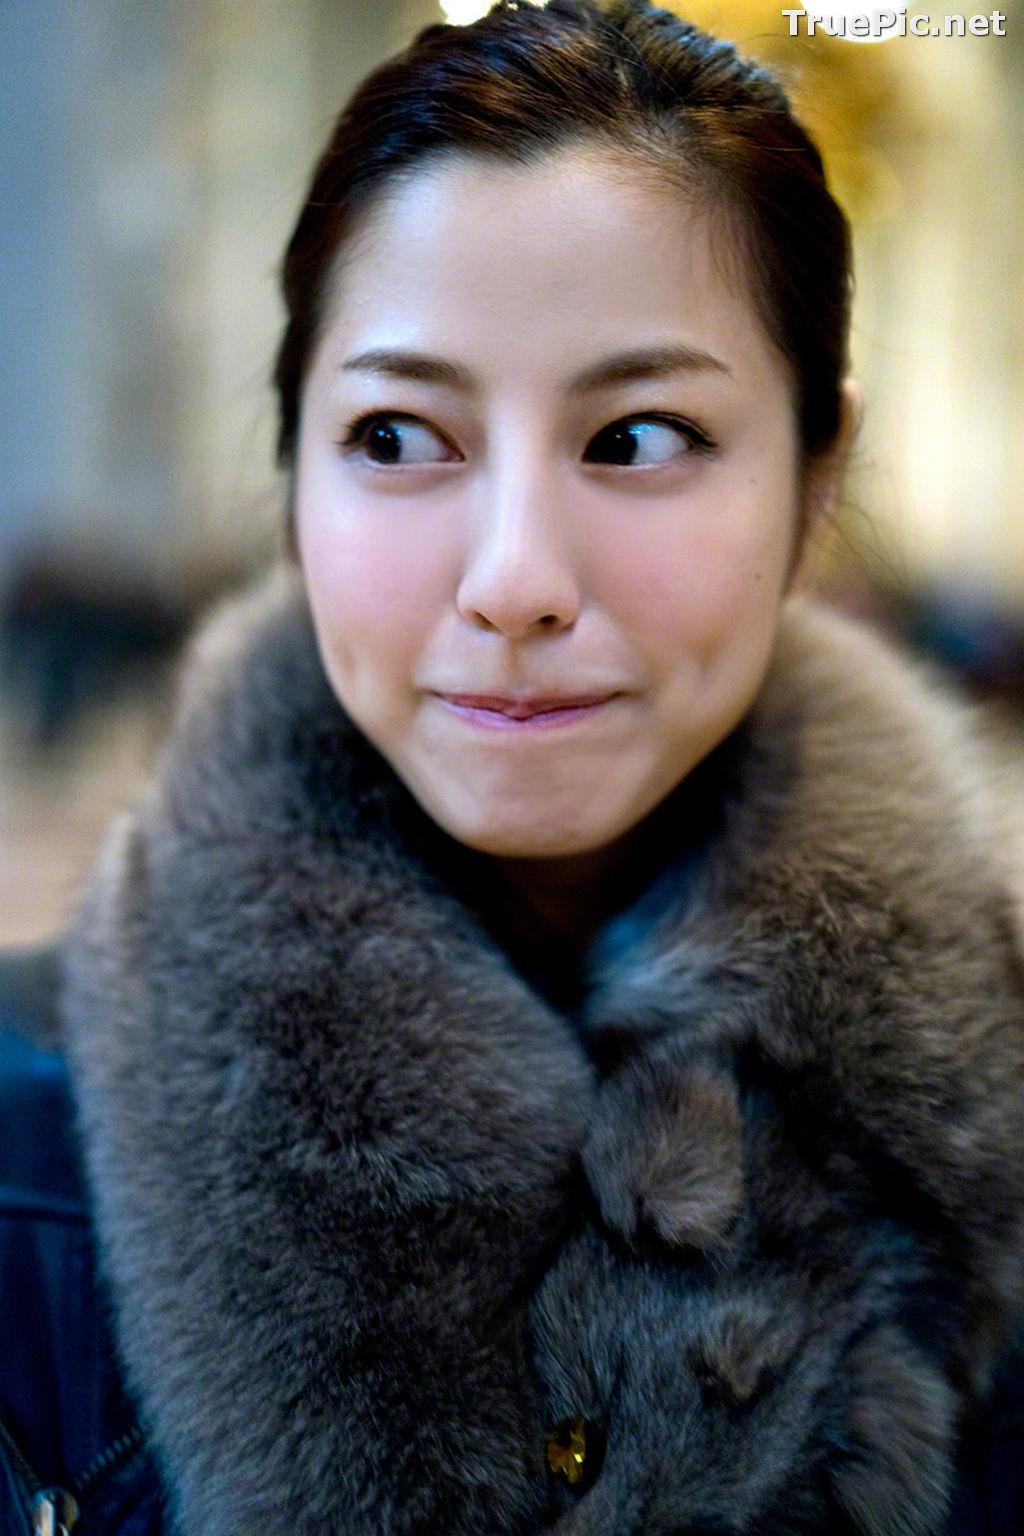 Image Wanibooks No.136 - Japanese Actress and Singer - Yumi Sugimoto - TruePic.net - Picture-2